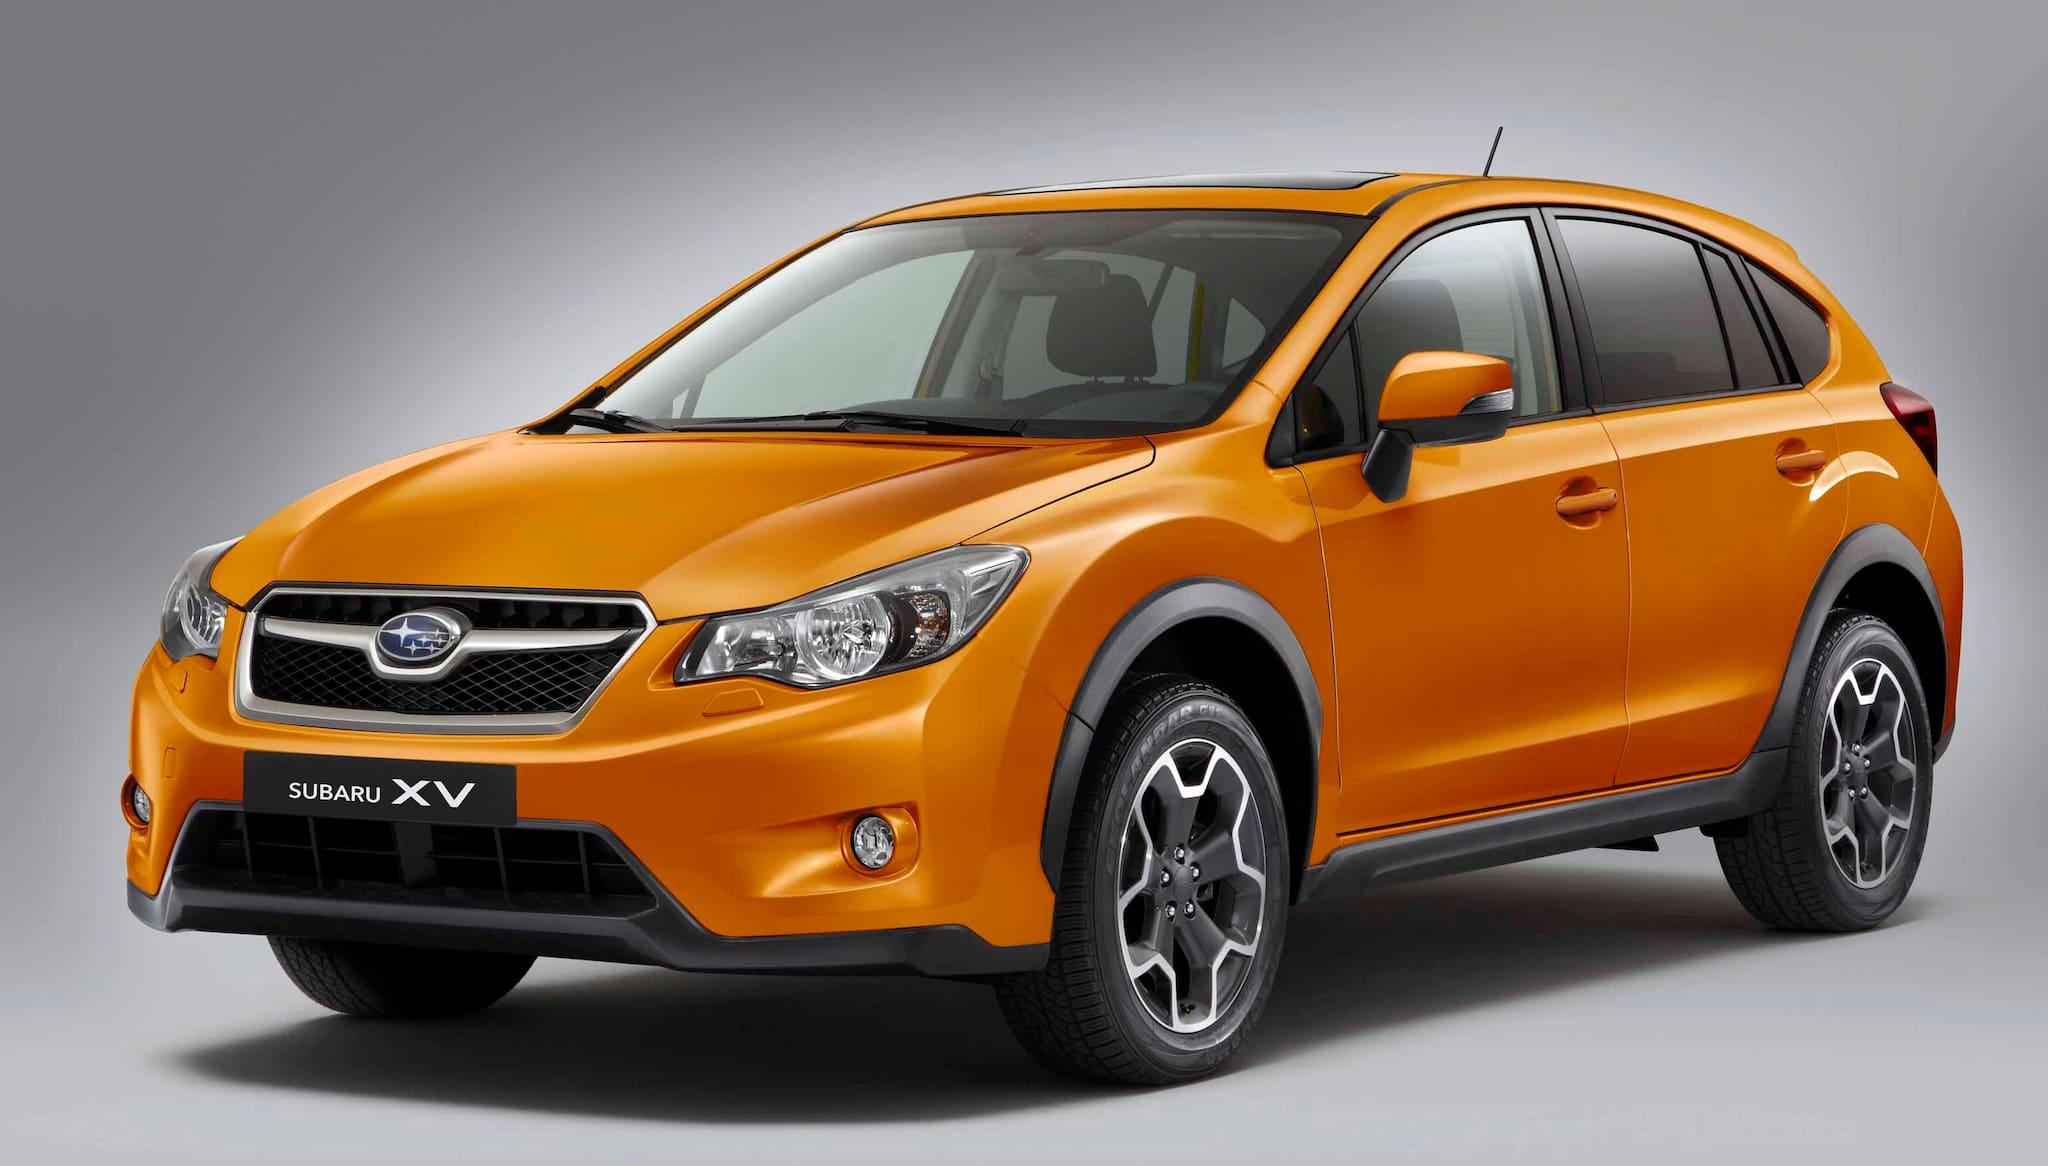 Subaru celebrates 7-day Kansha Festival